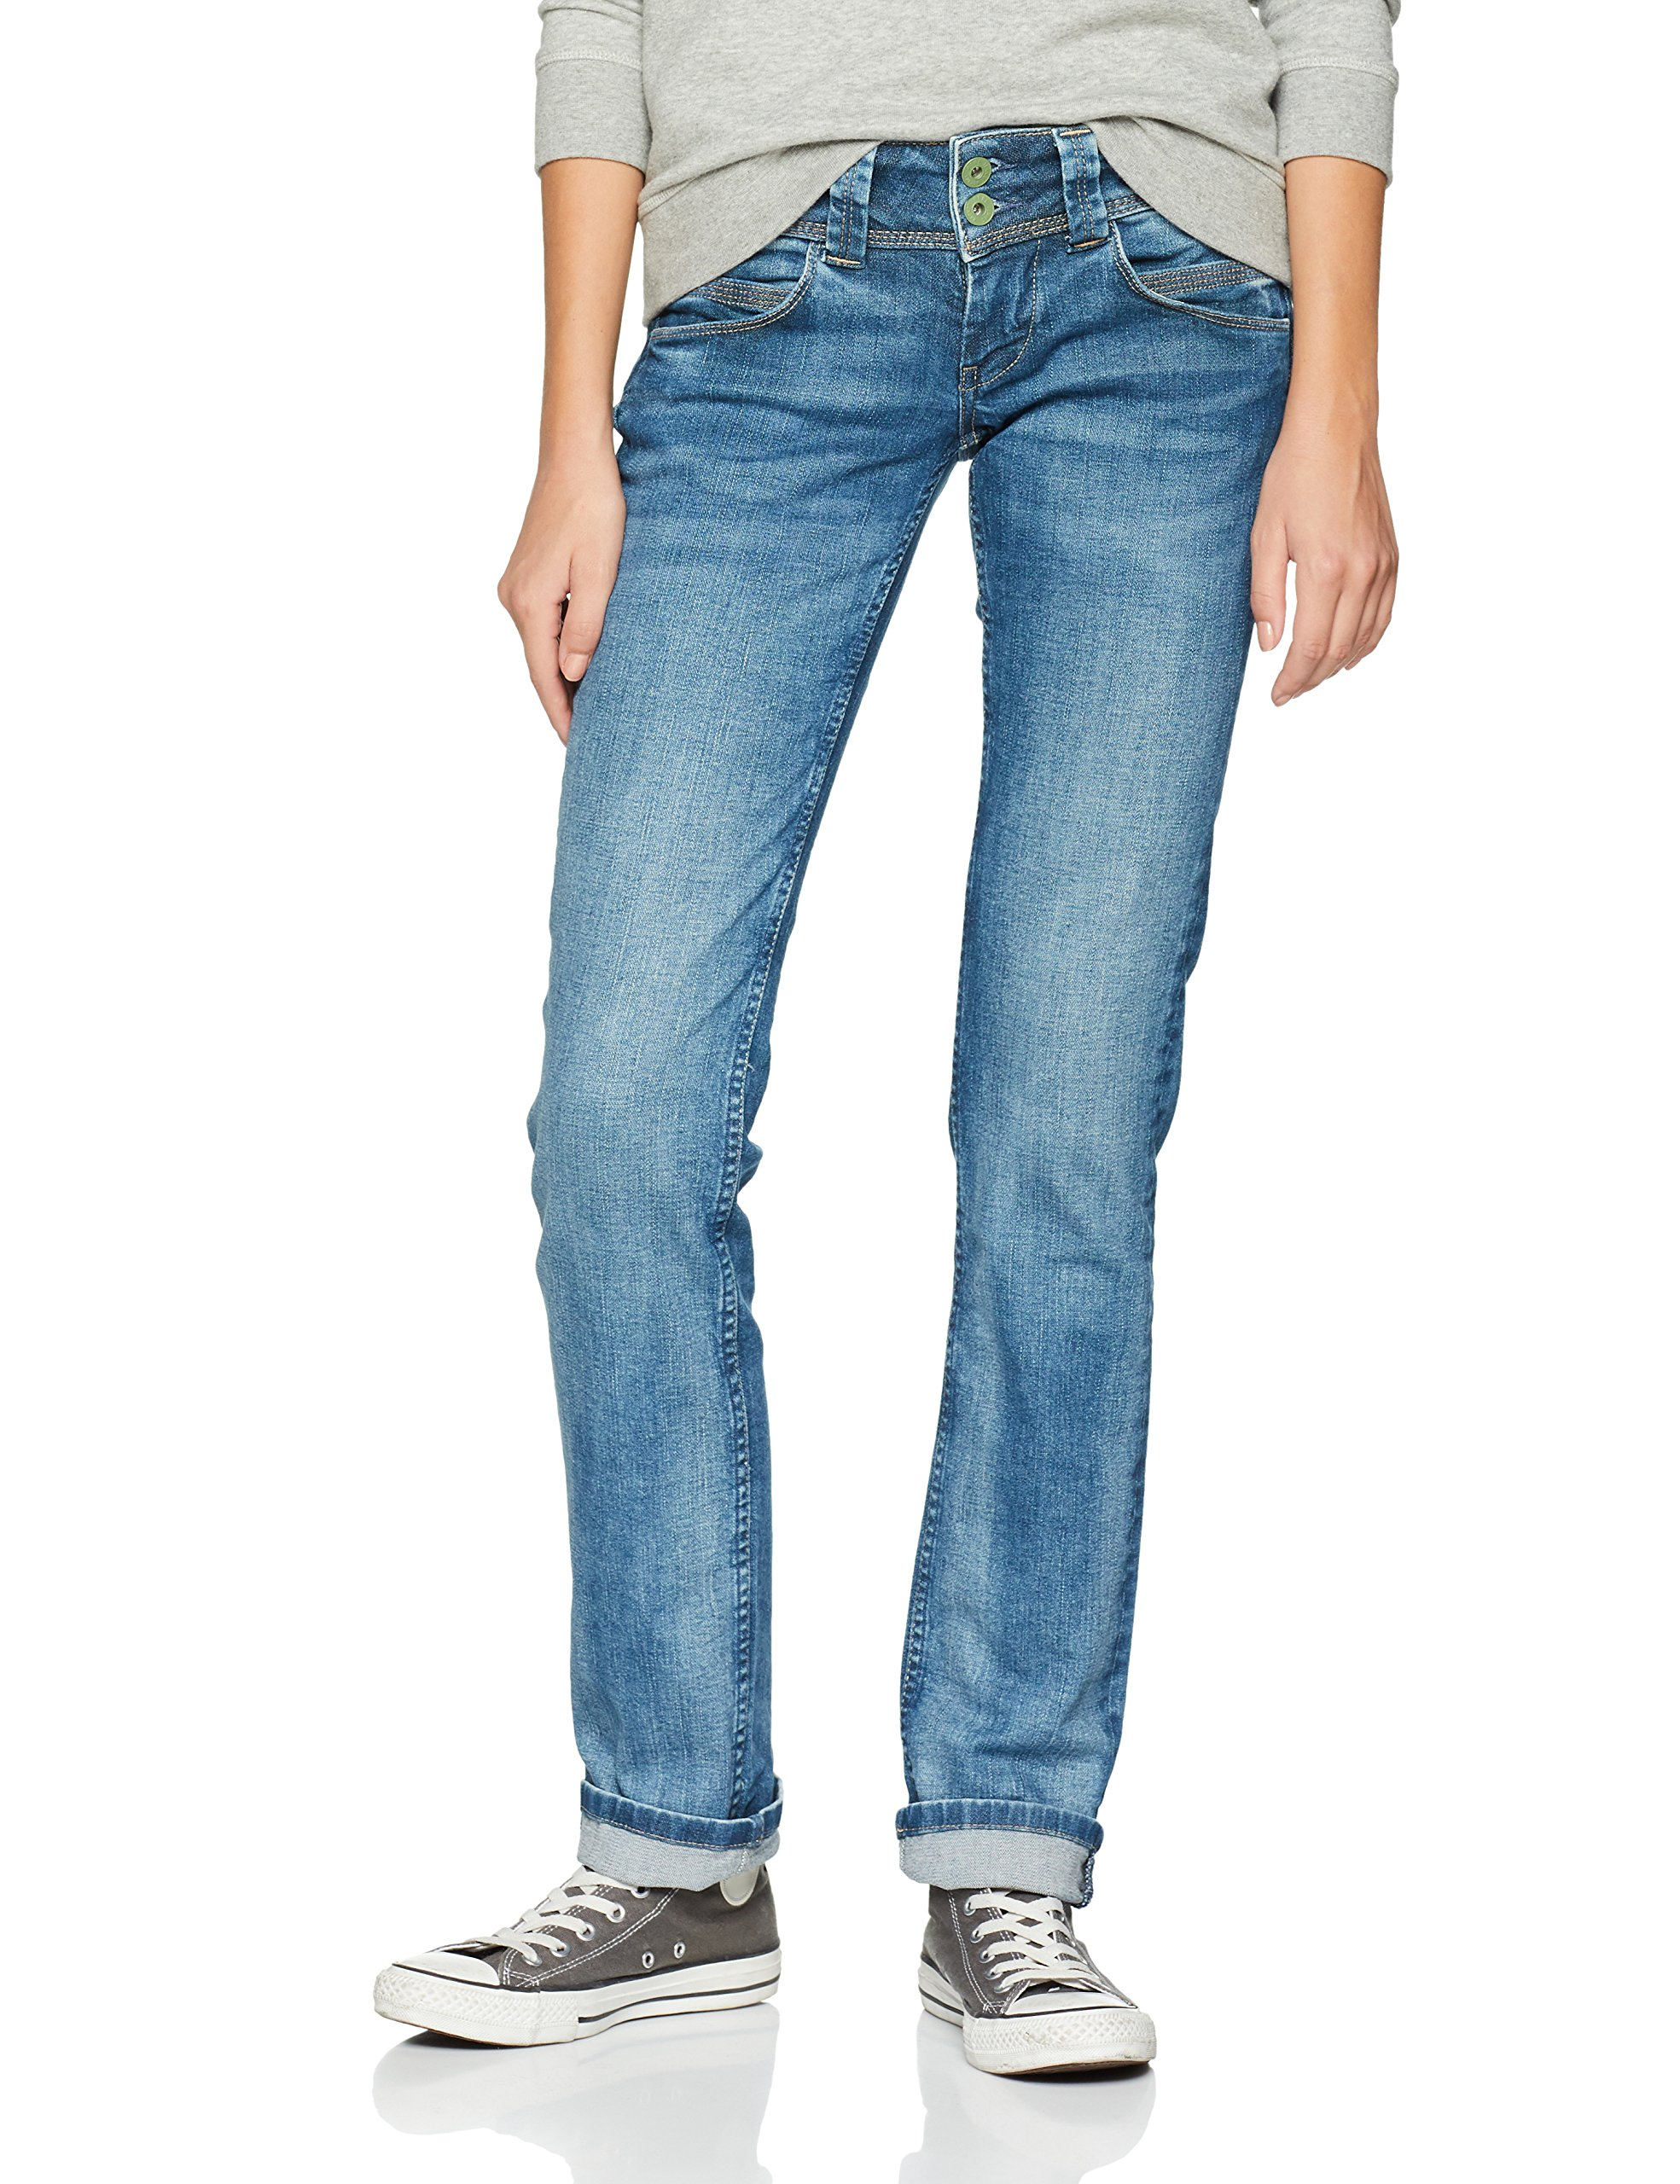 DroitWiser Femme Pepe Jeans Wash Denim31w34l Venus Jean RjAL543q